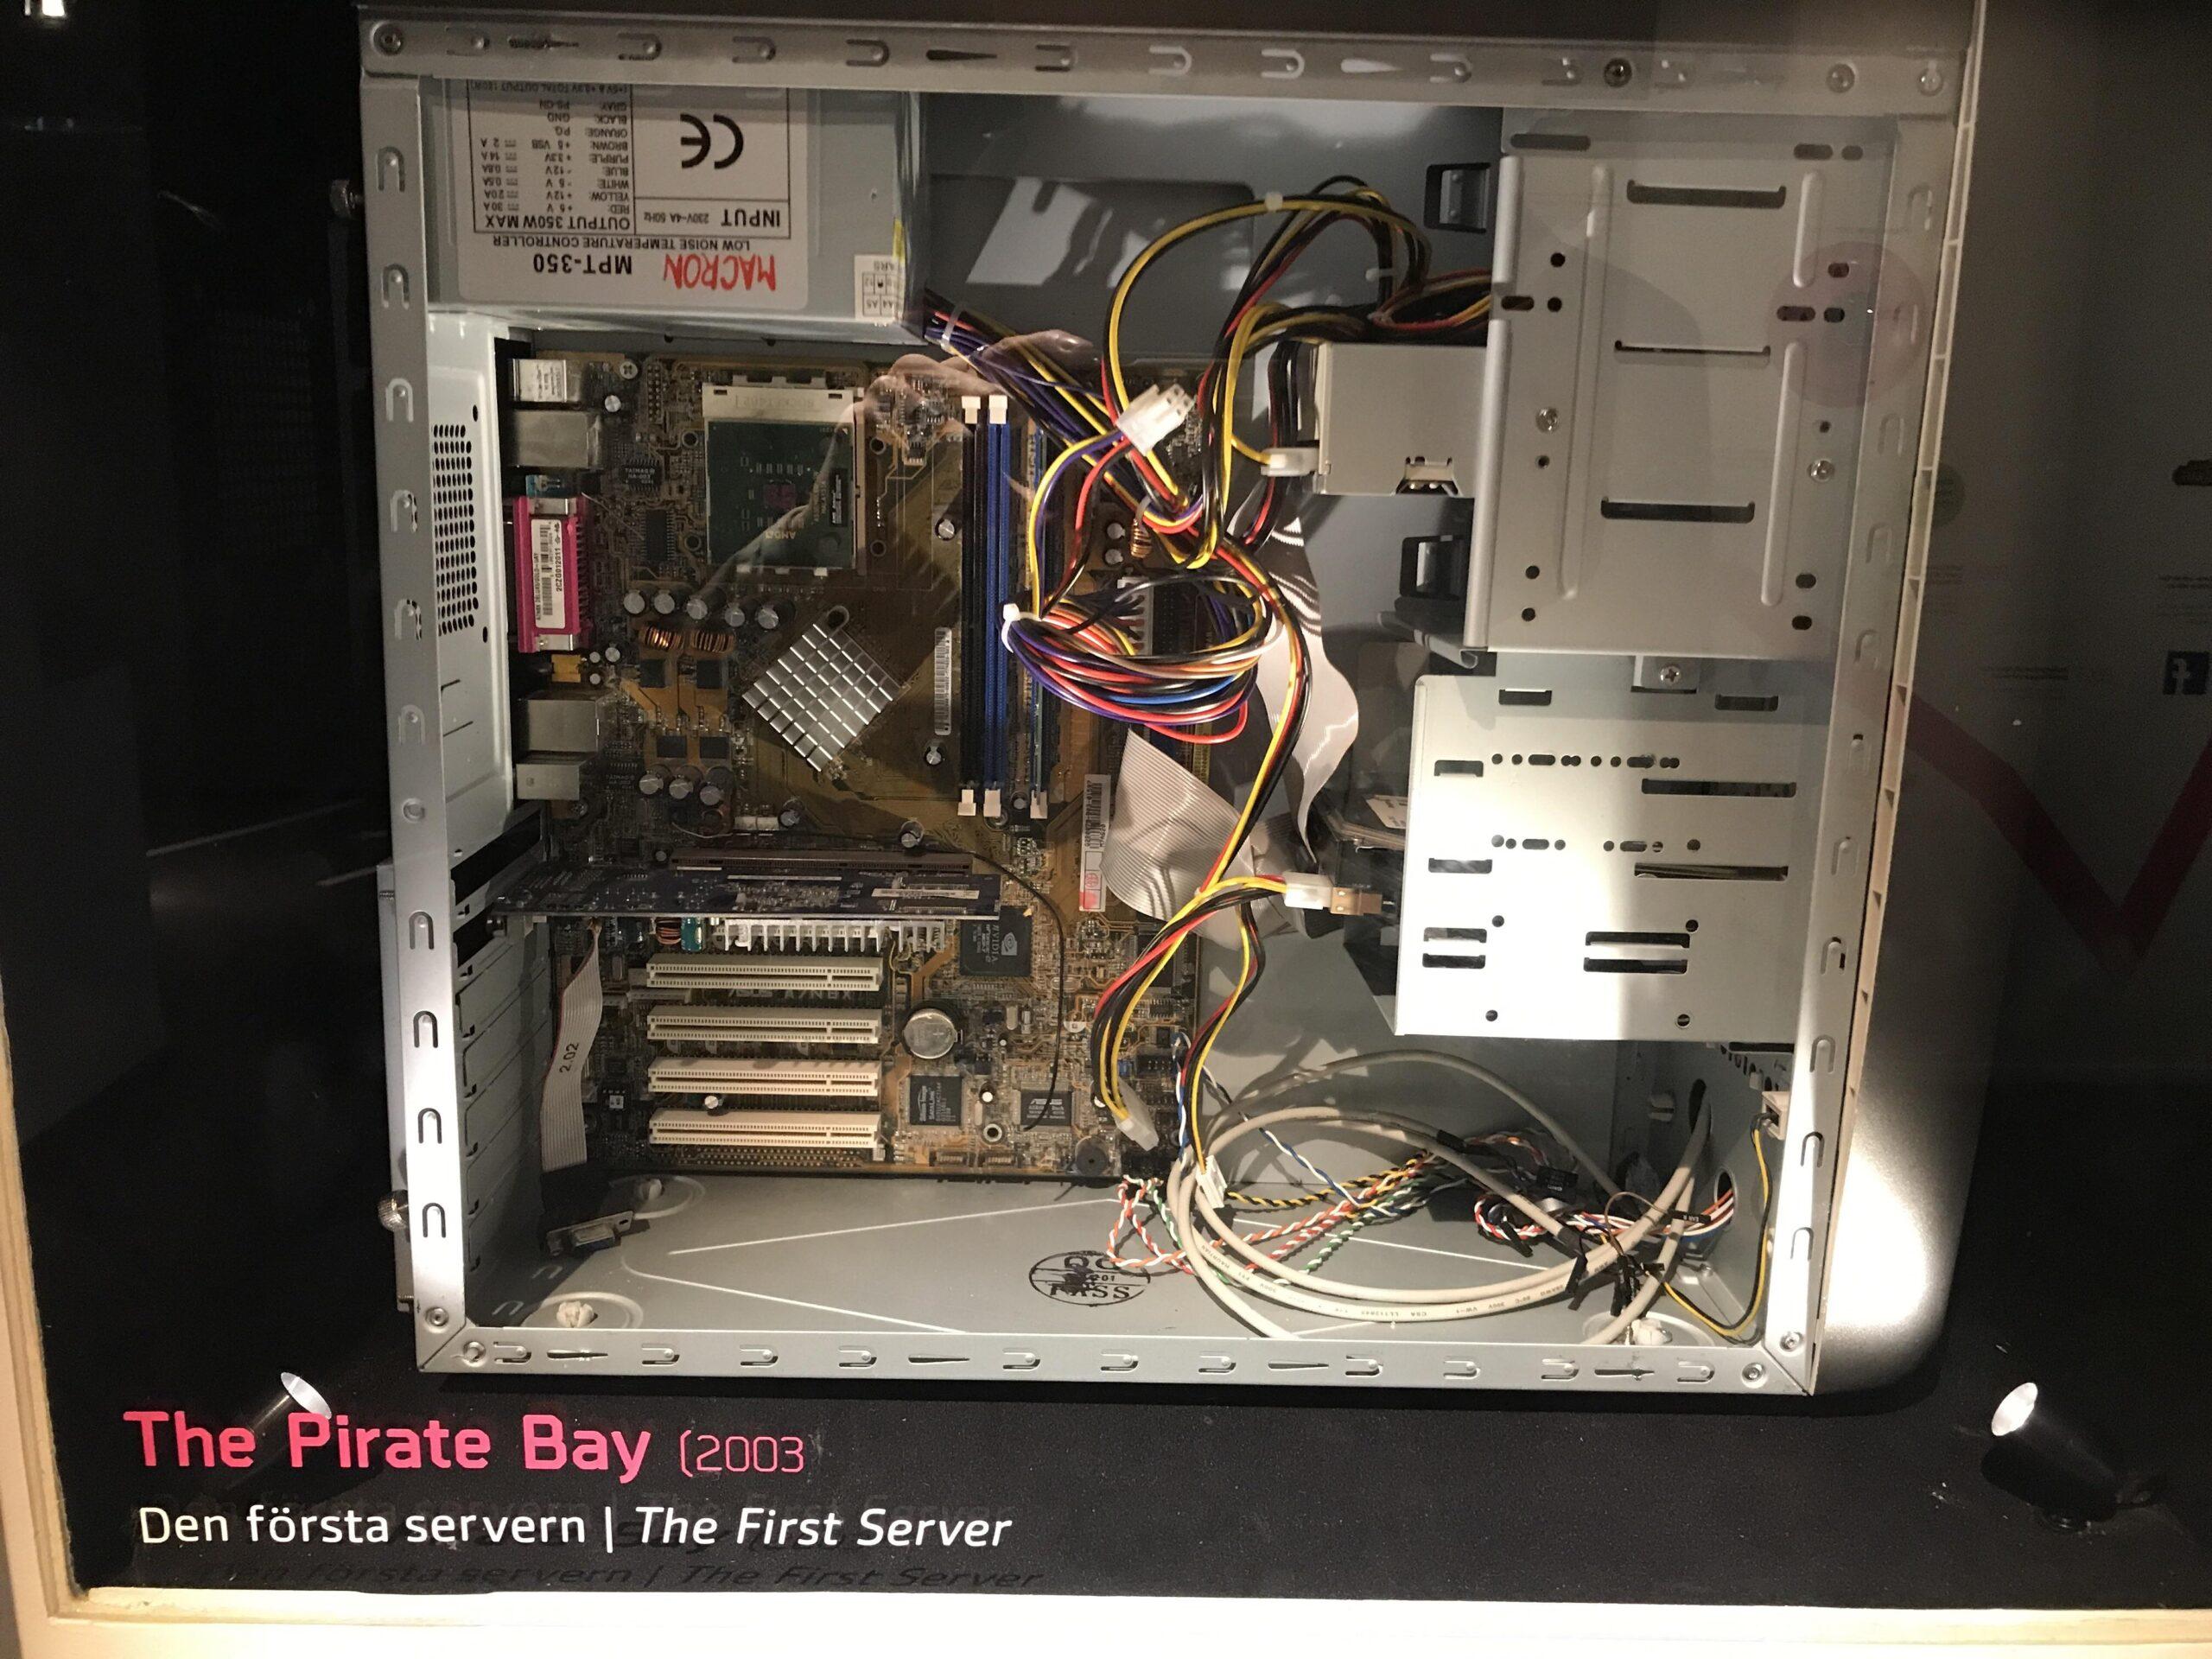 pirateria, piratebay, server